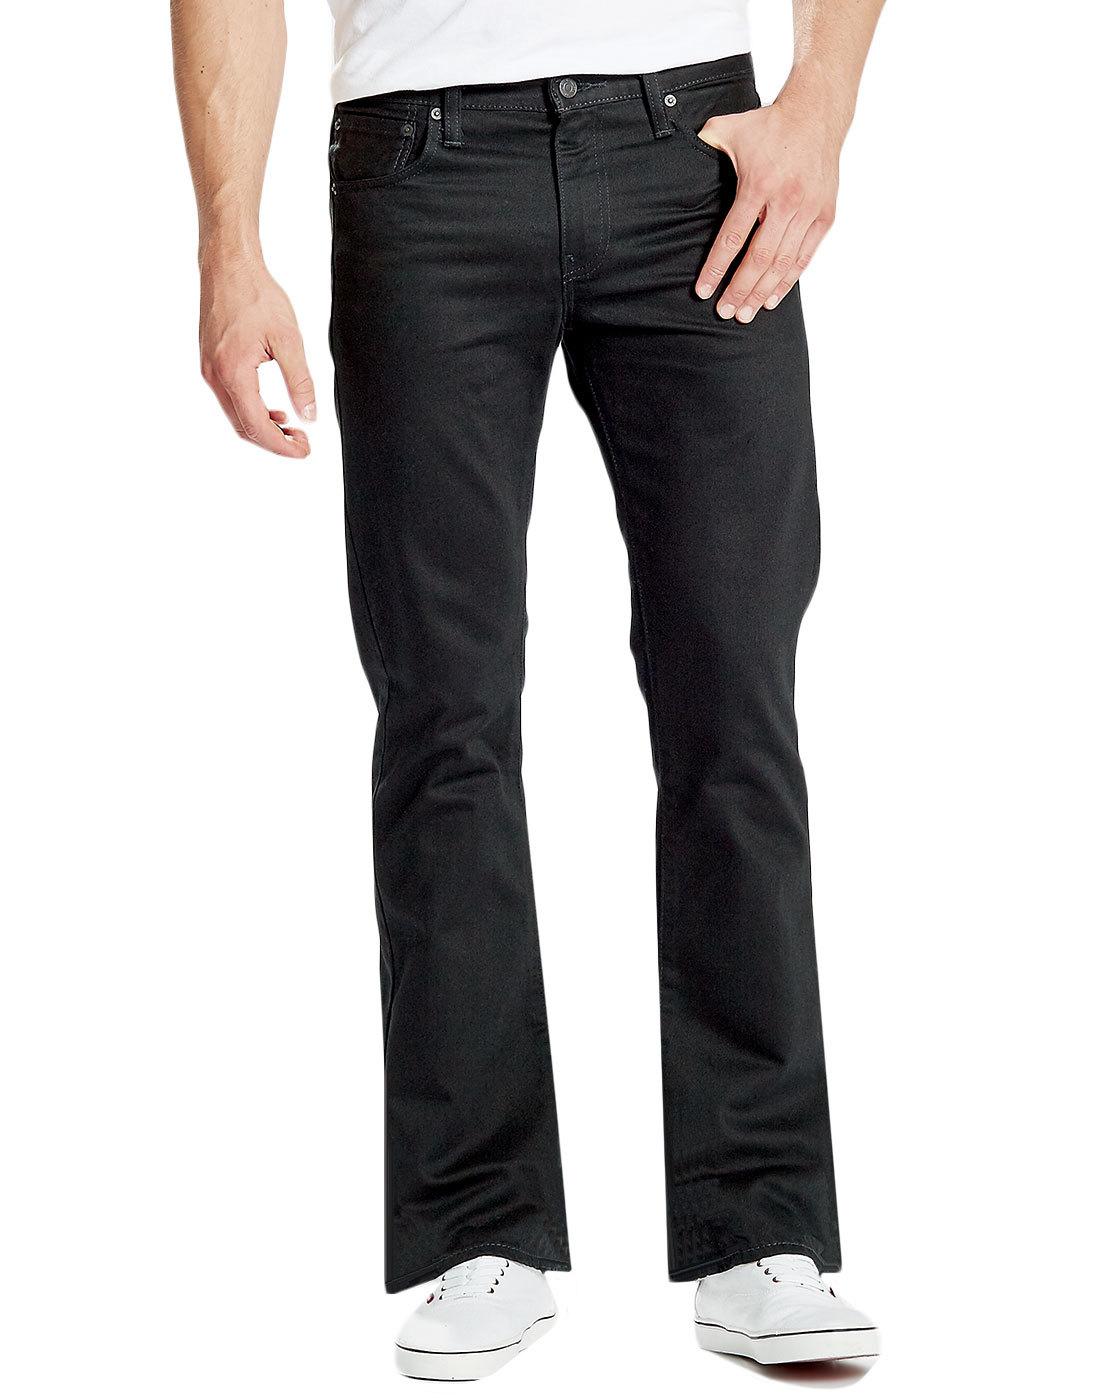 fe361268da LEVI S® 527 Retro Mens Slim Boot Cut Denim Jeans in Black Rinse